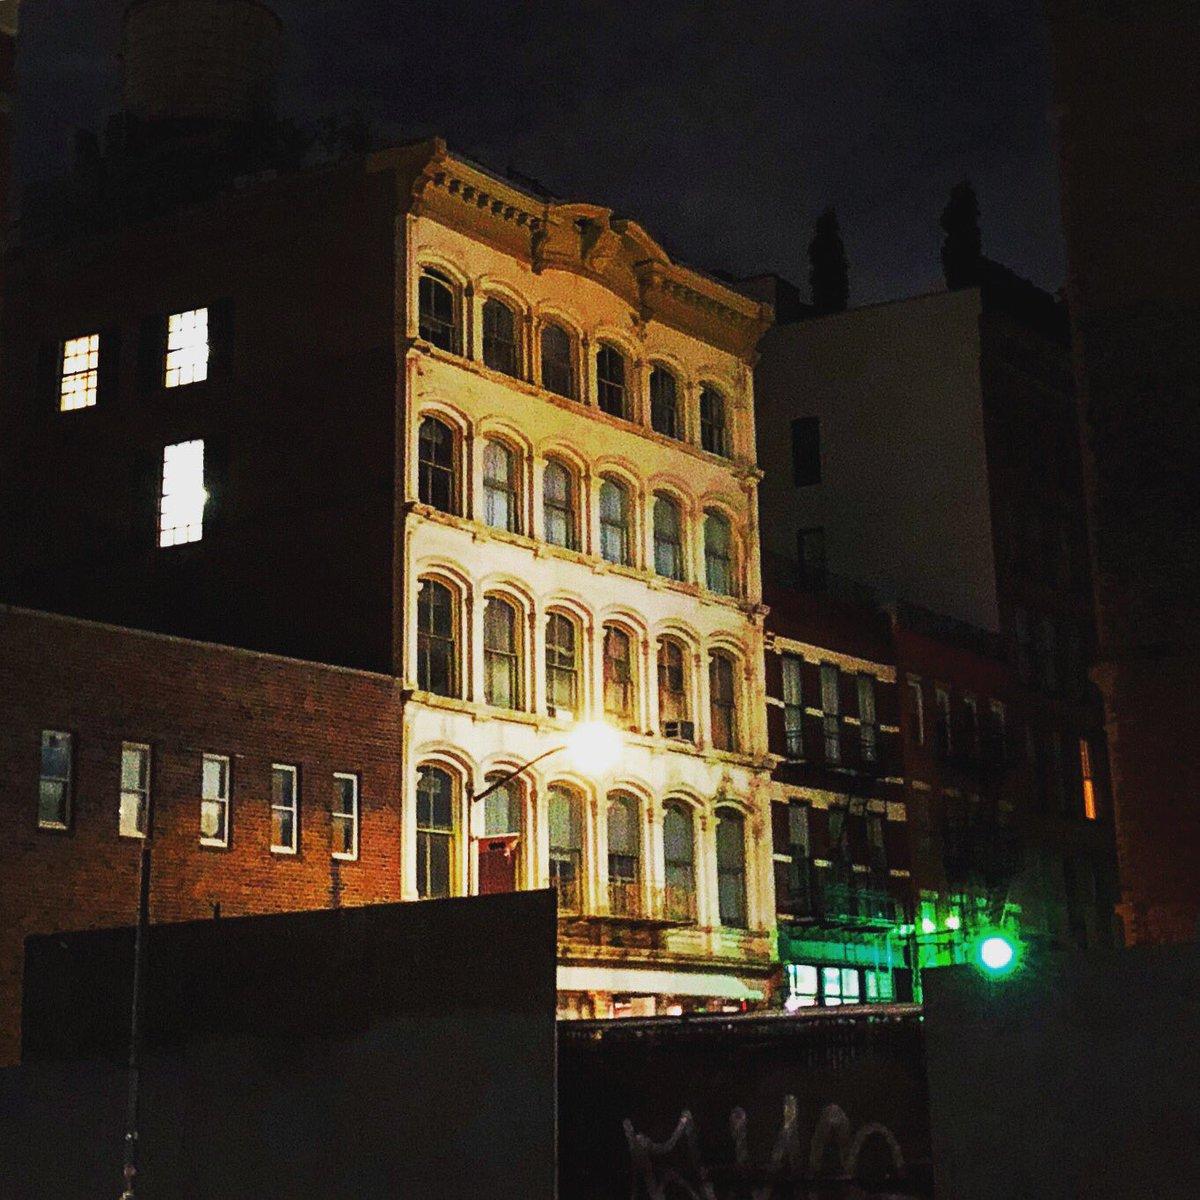 SoHo, NYC Instagram: instagram.com/michi_kakutani/